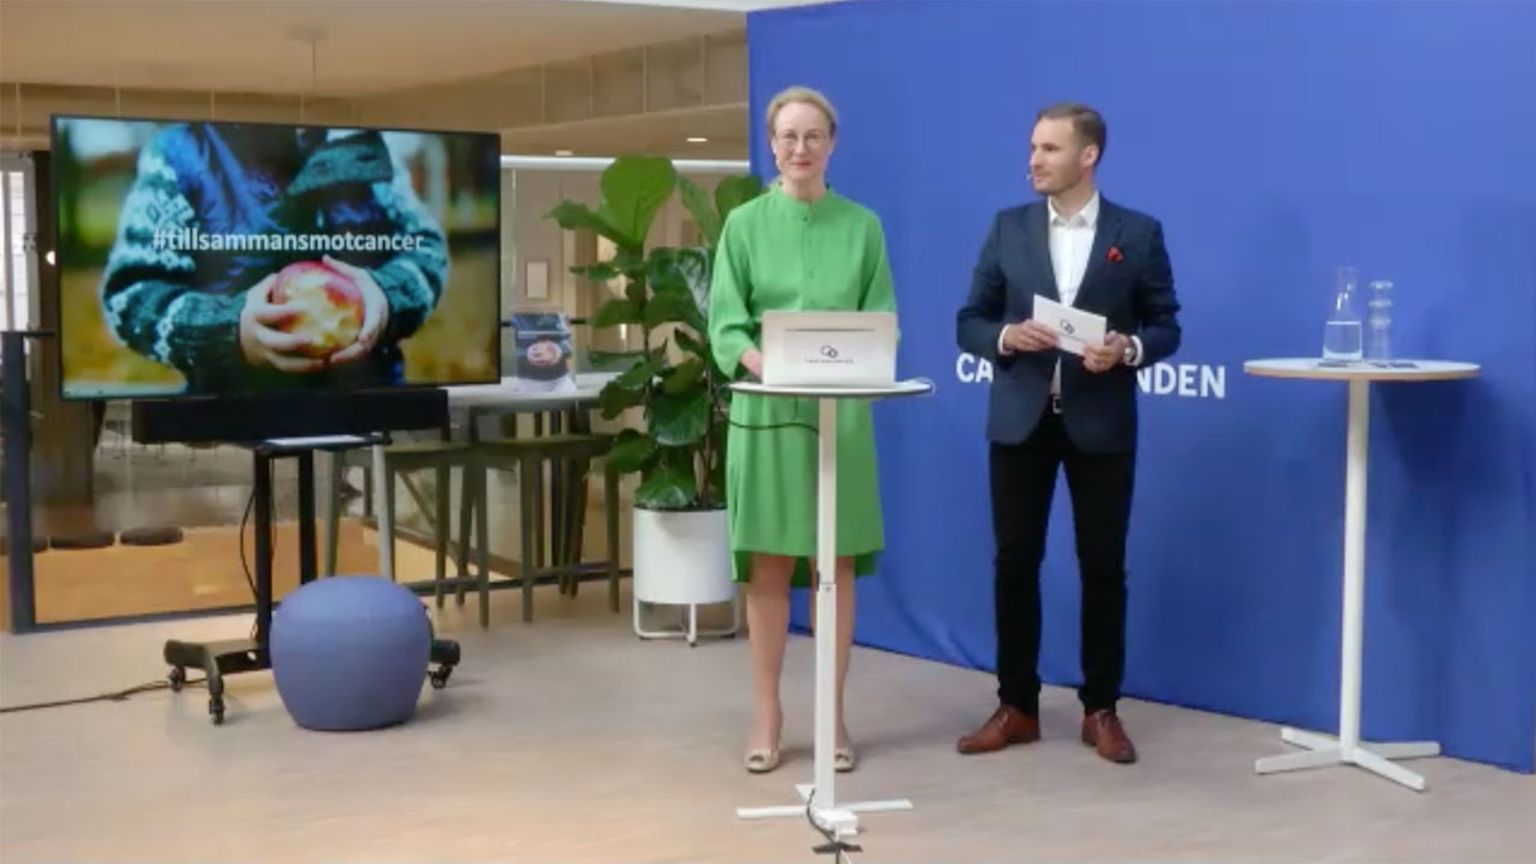 Cancerfondens generalsekreterare Ulrika Årehed Kågström och politiskt sakkunnig Simon Holmesson